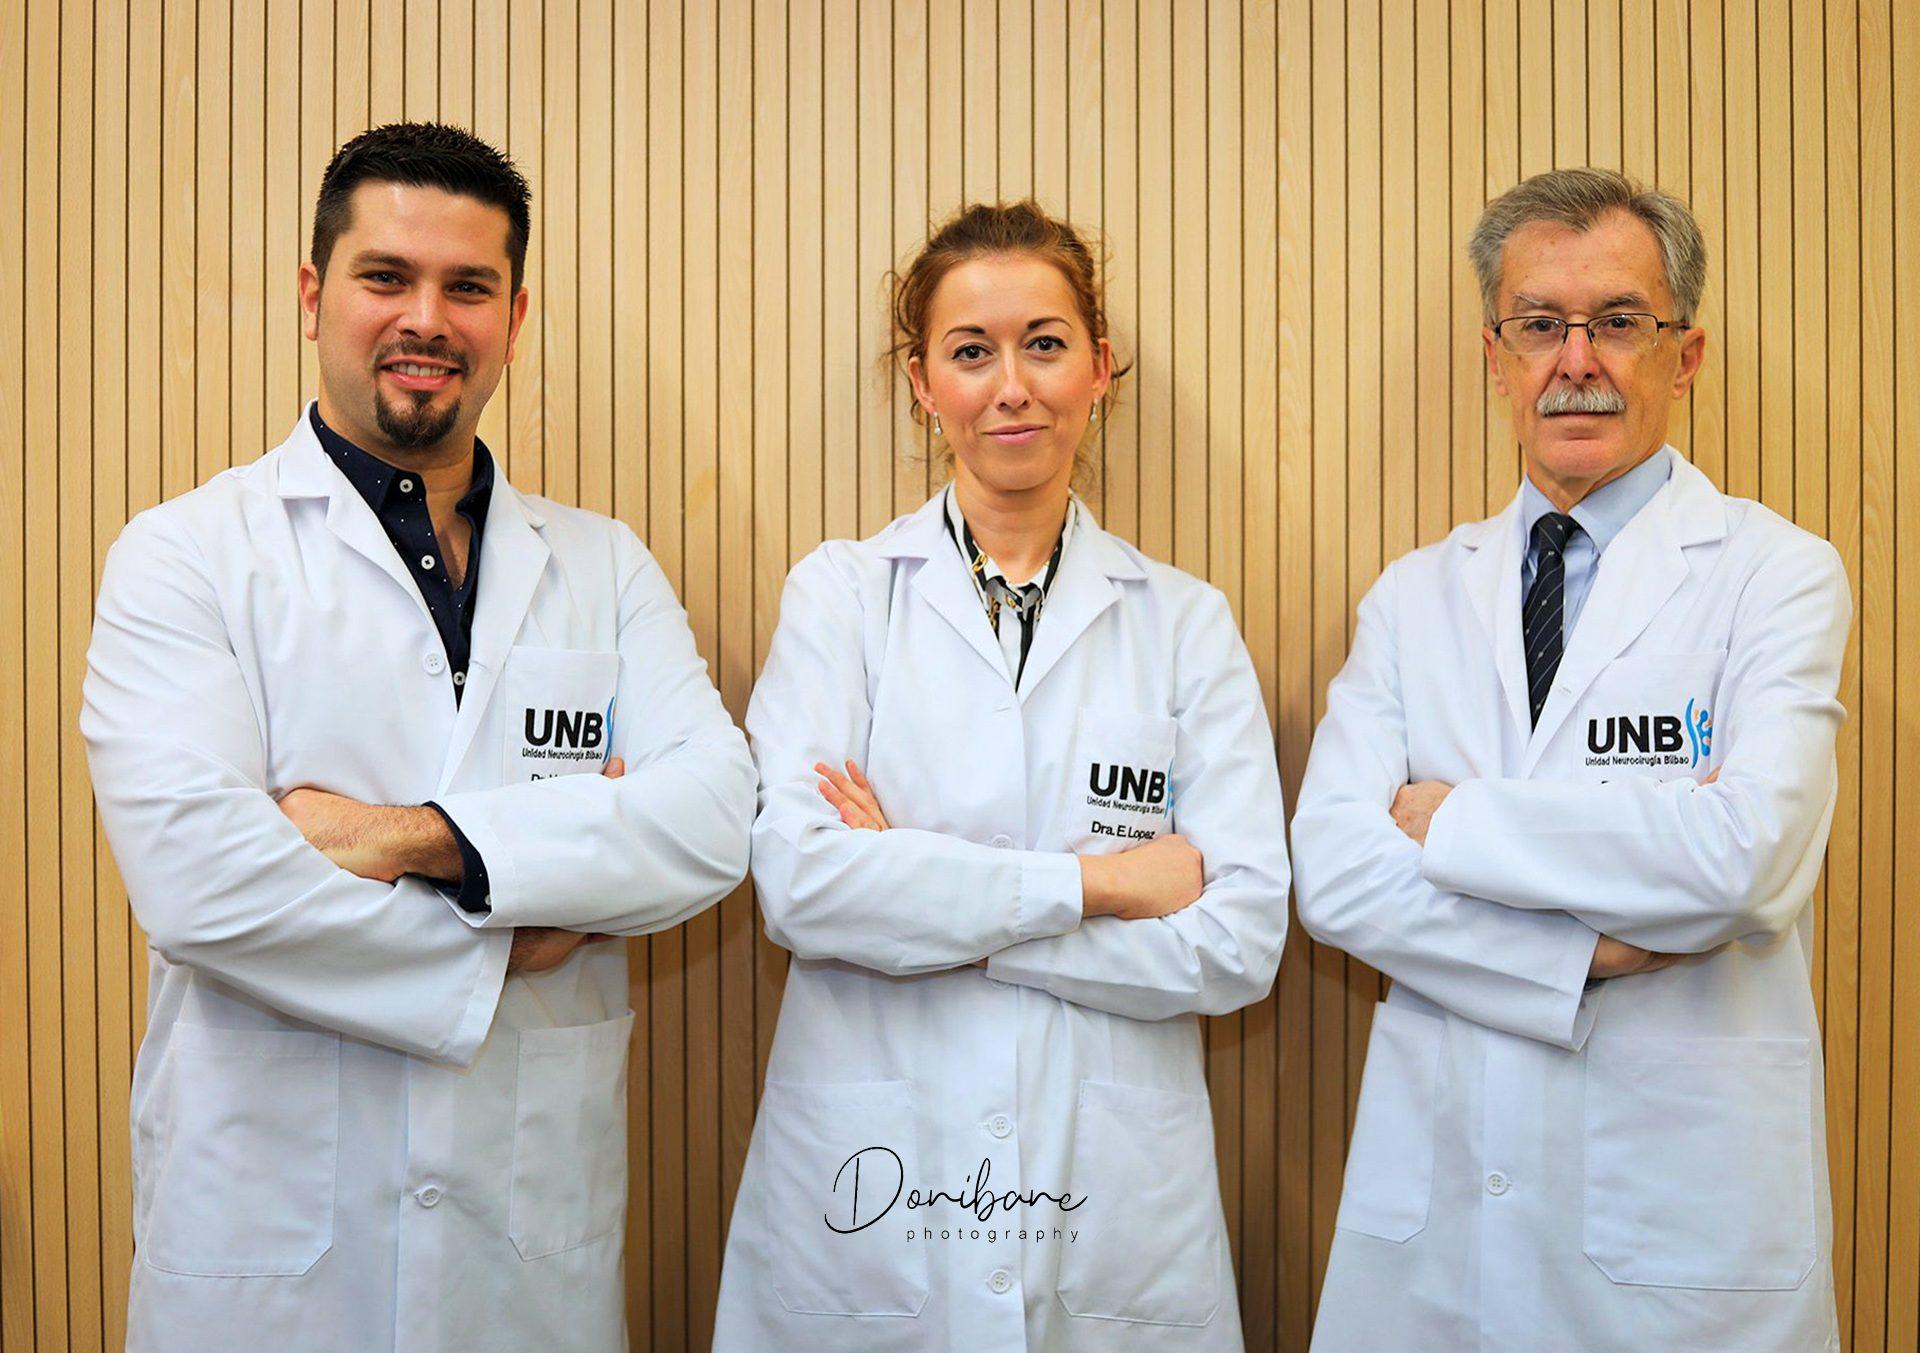 UNB neurocirujanos Bilbao por Donibane